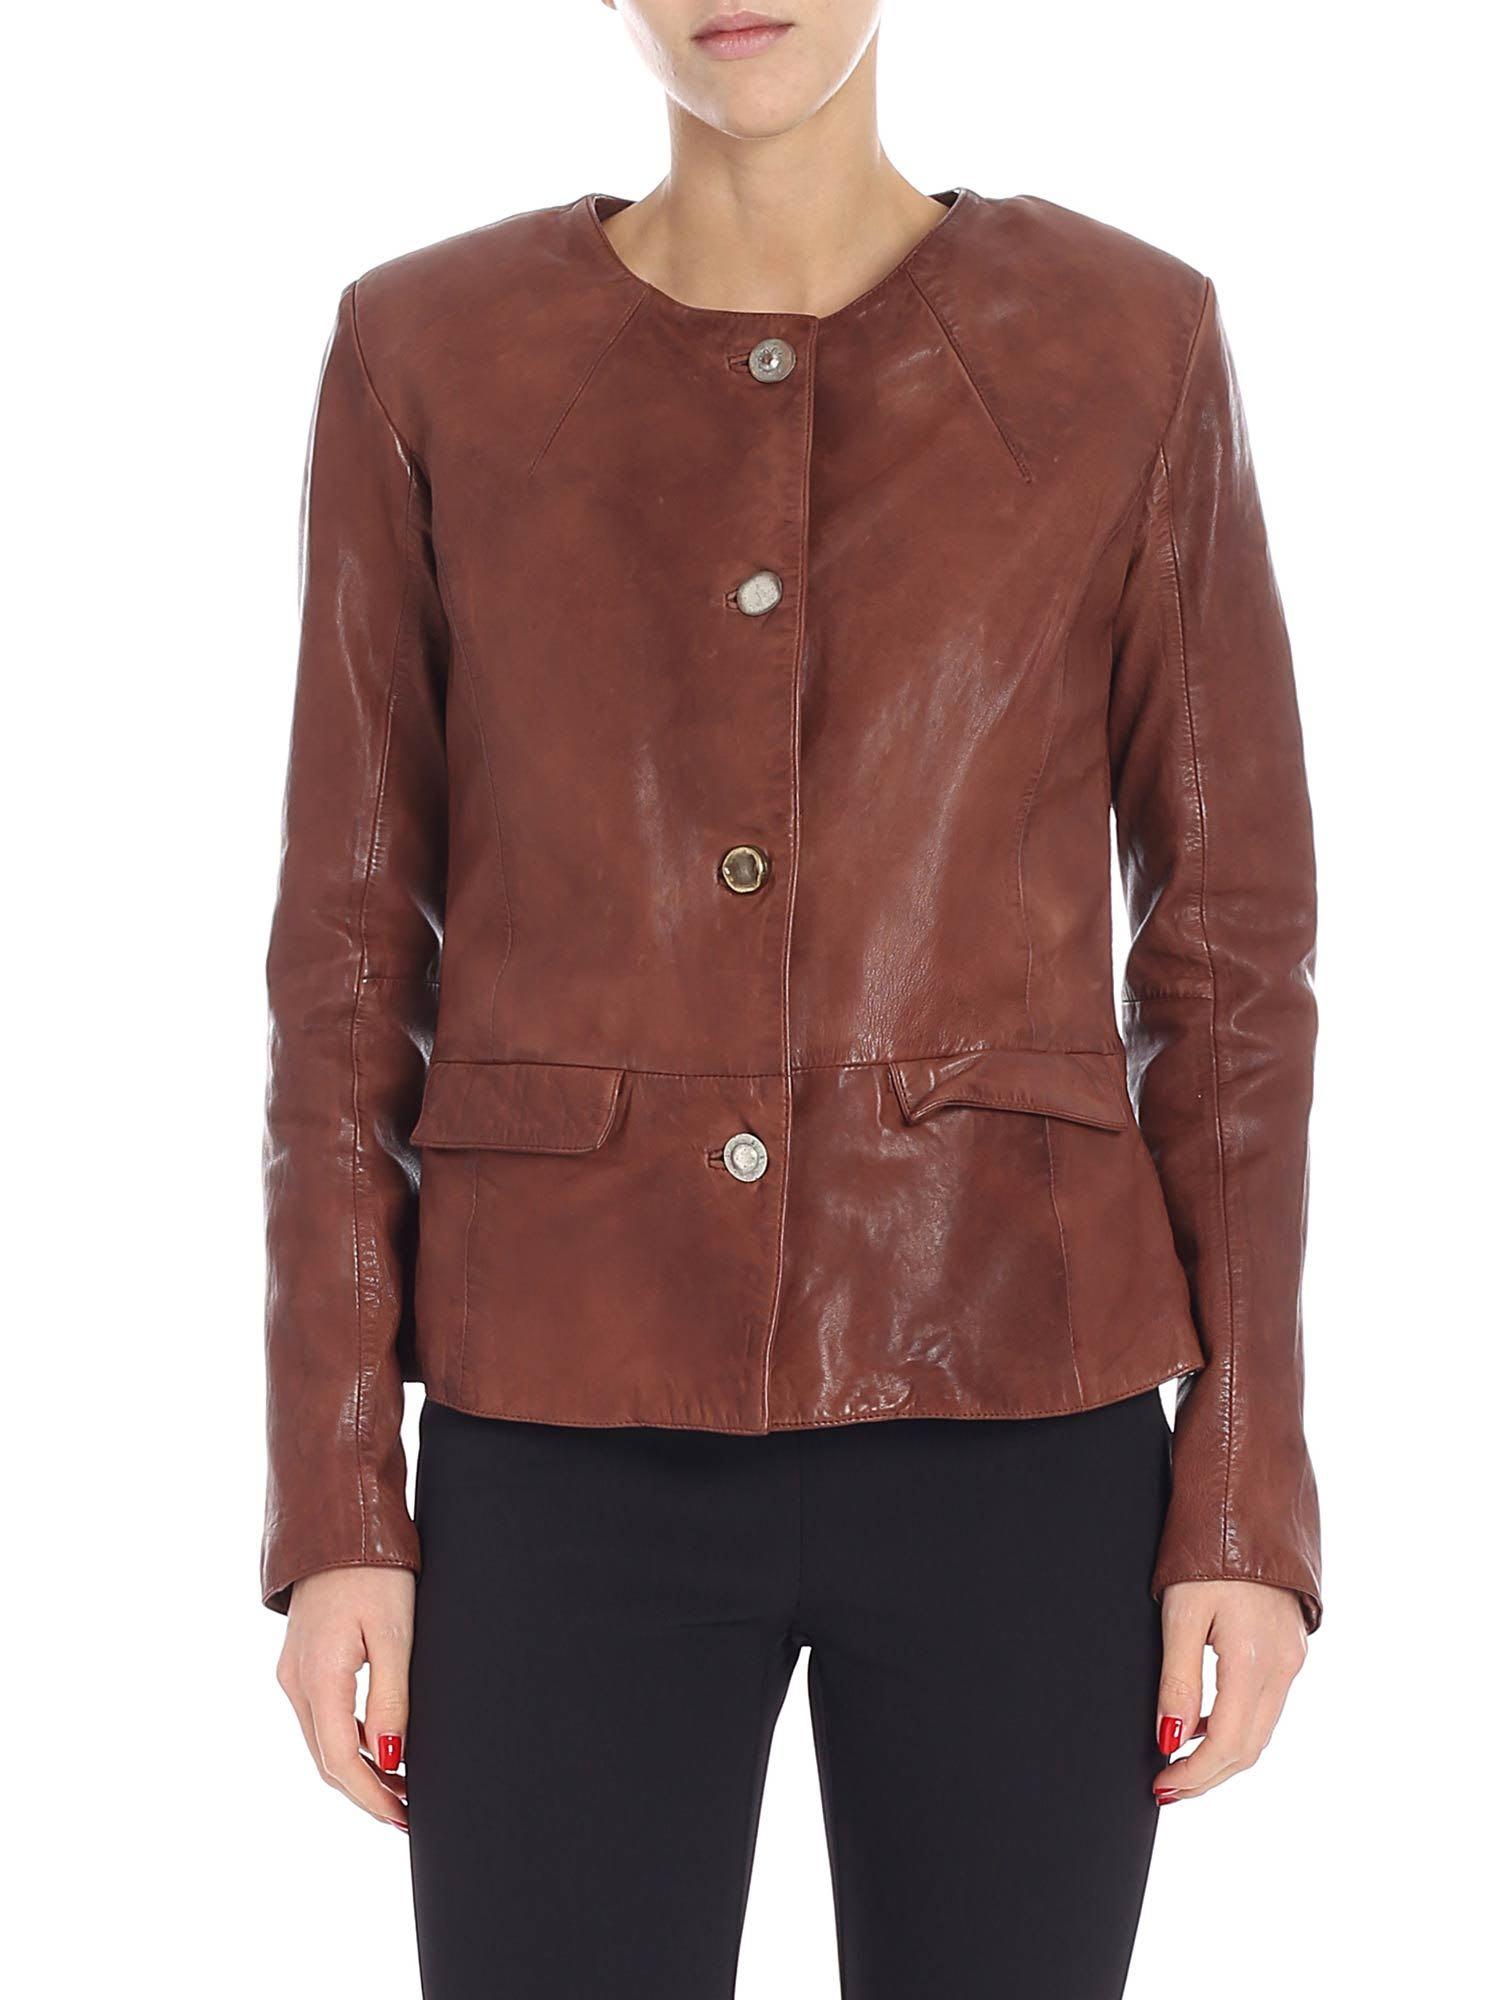 S.w.o.r.d. – Leather Jacket